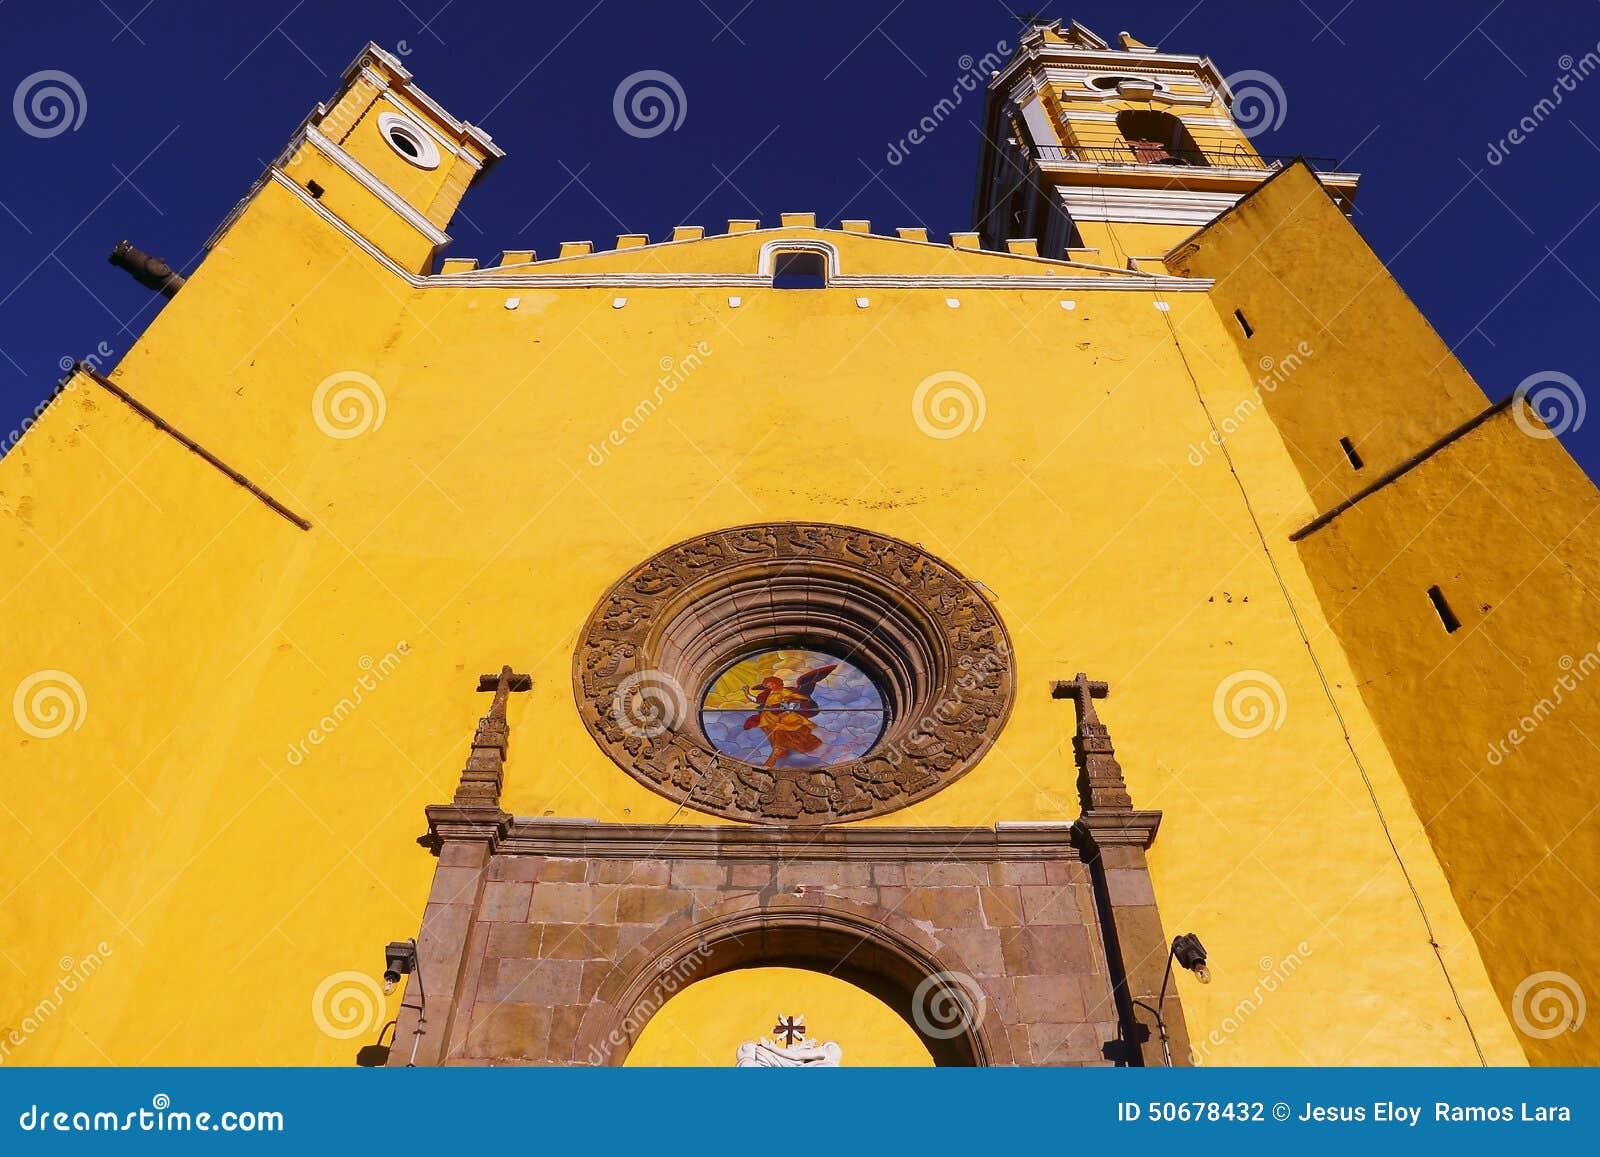 Download 圣加布里埃尔女修道院VI 库存照片. 图片 包括有 男修道院, 城市, 天使, 拱道, 基布里埃尔, 教会 - 50678432